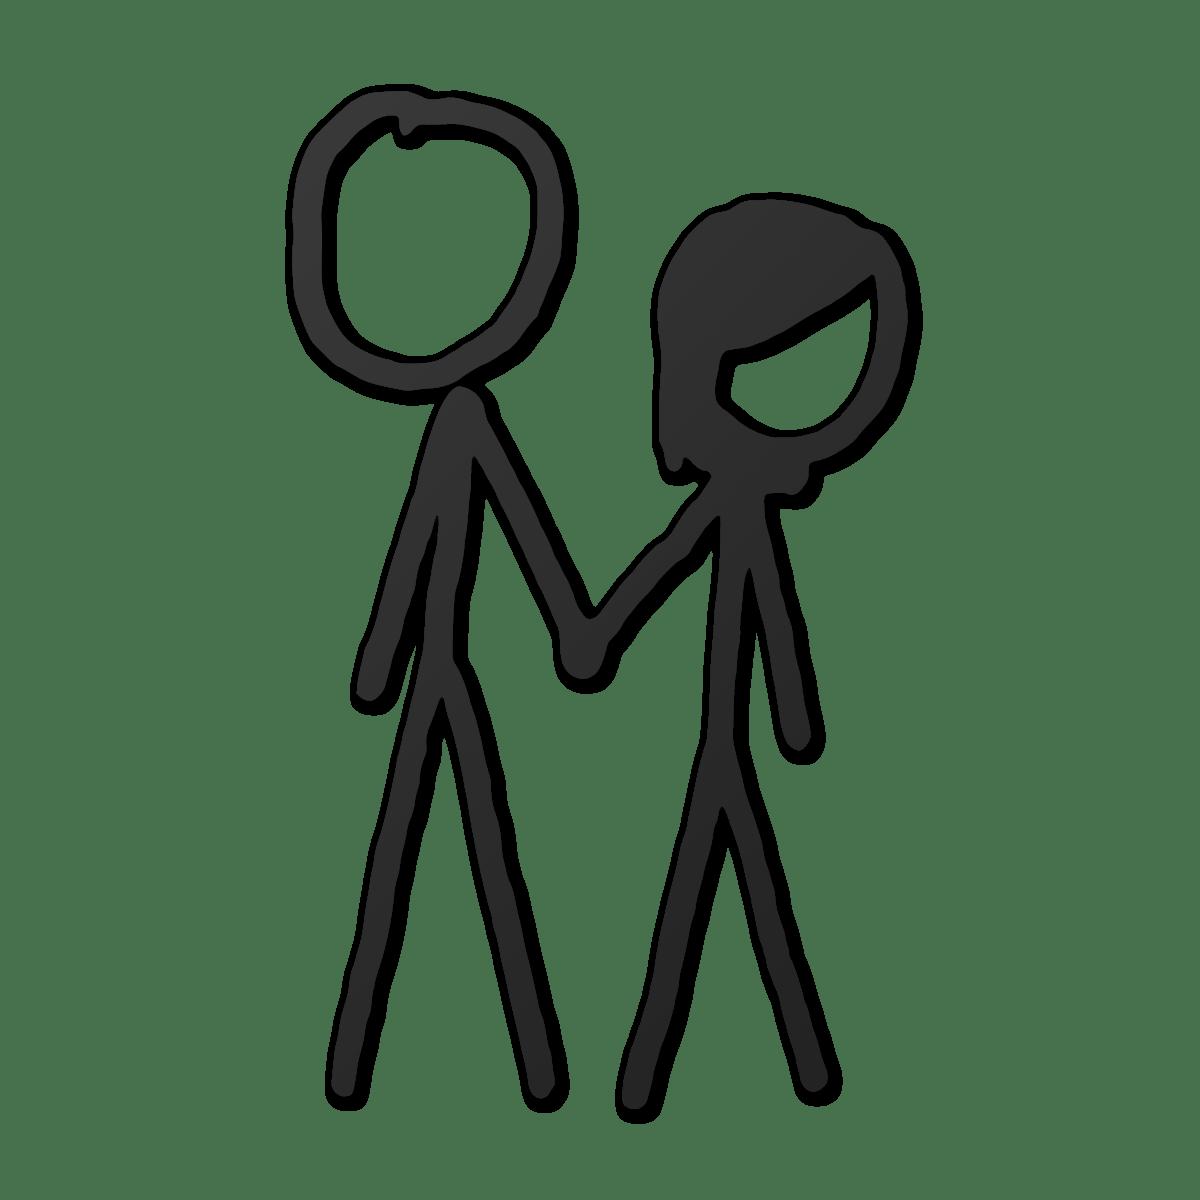 TECHNO-RELATIONSHIPS